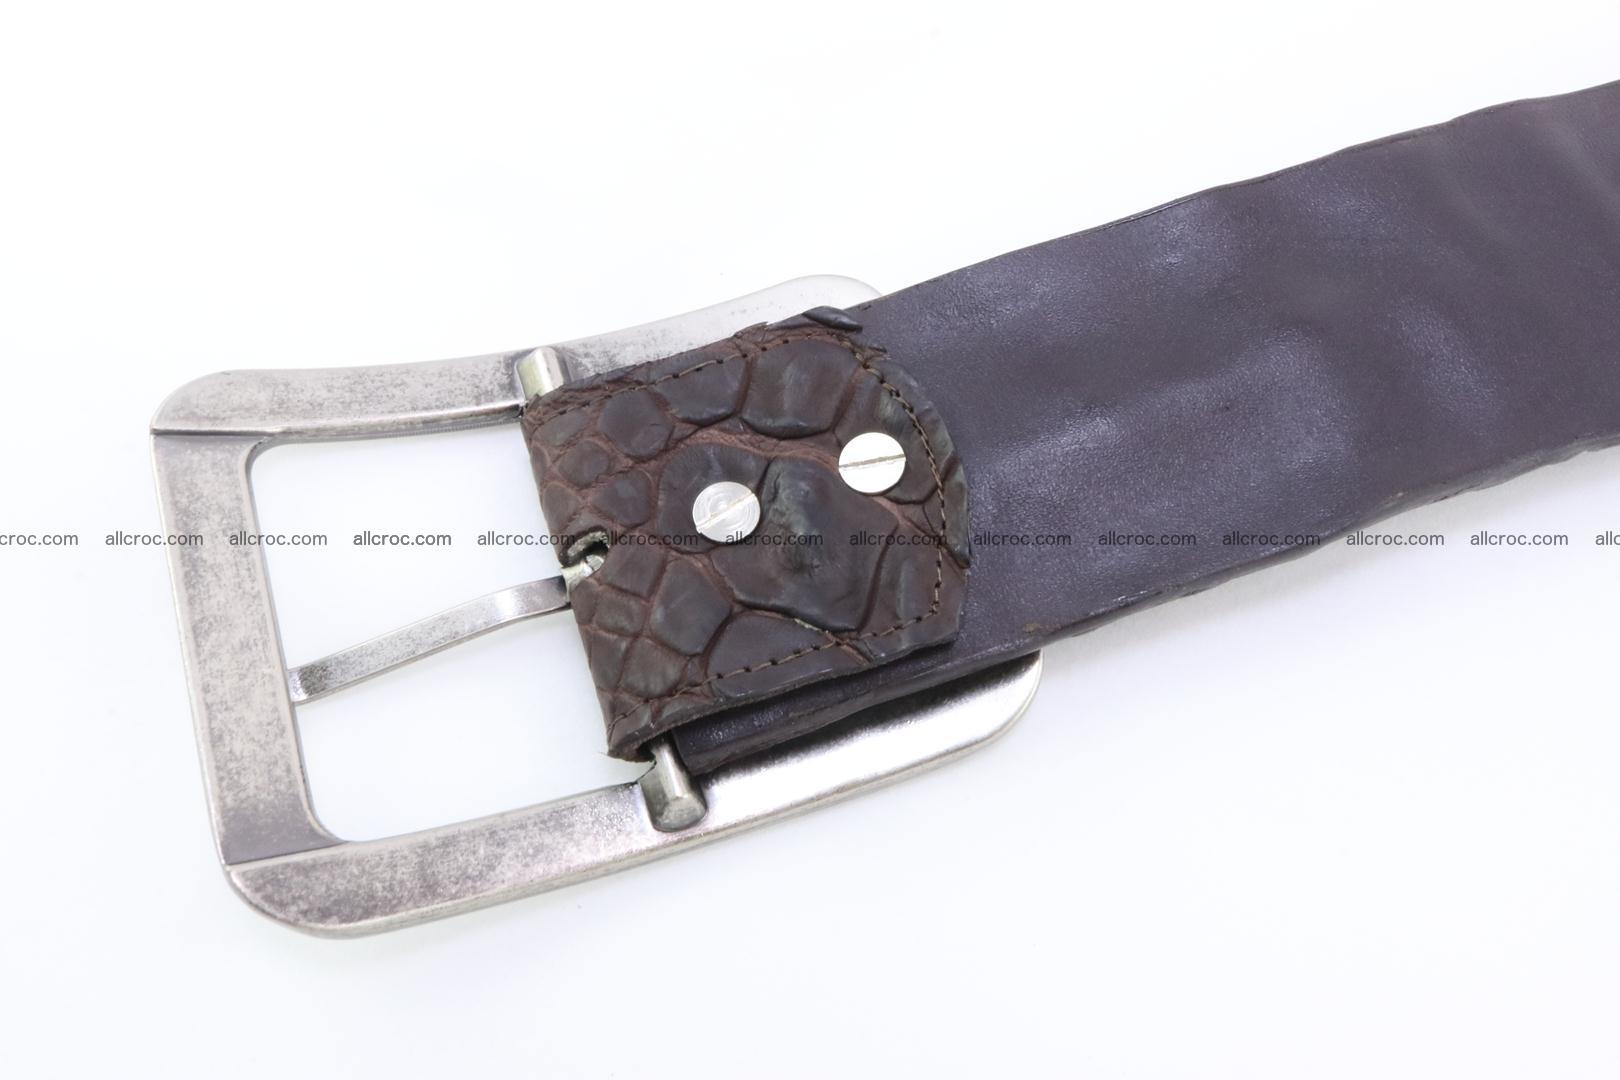 Genuine crocodile hornback belt for jeans width 50mm 155 Foto 7